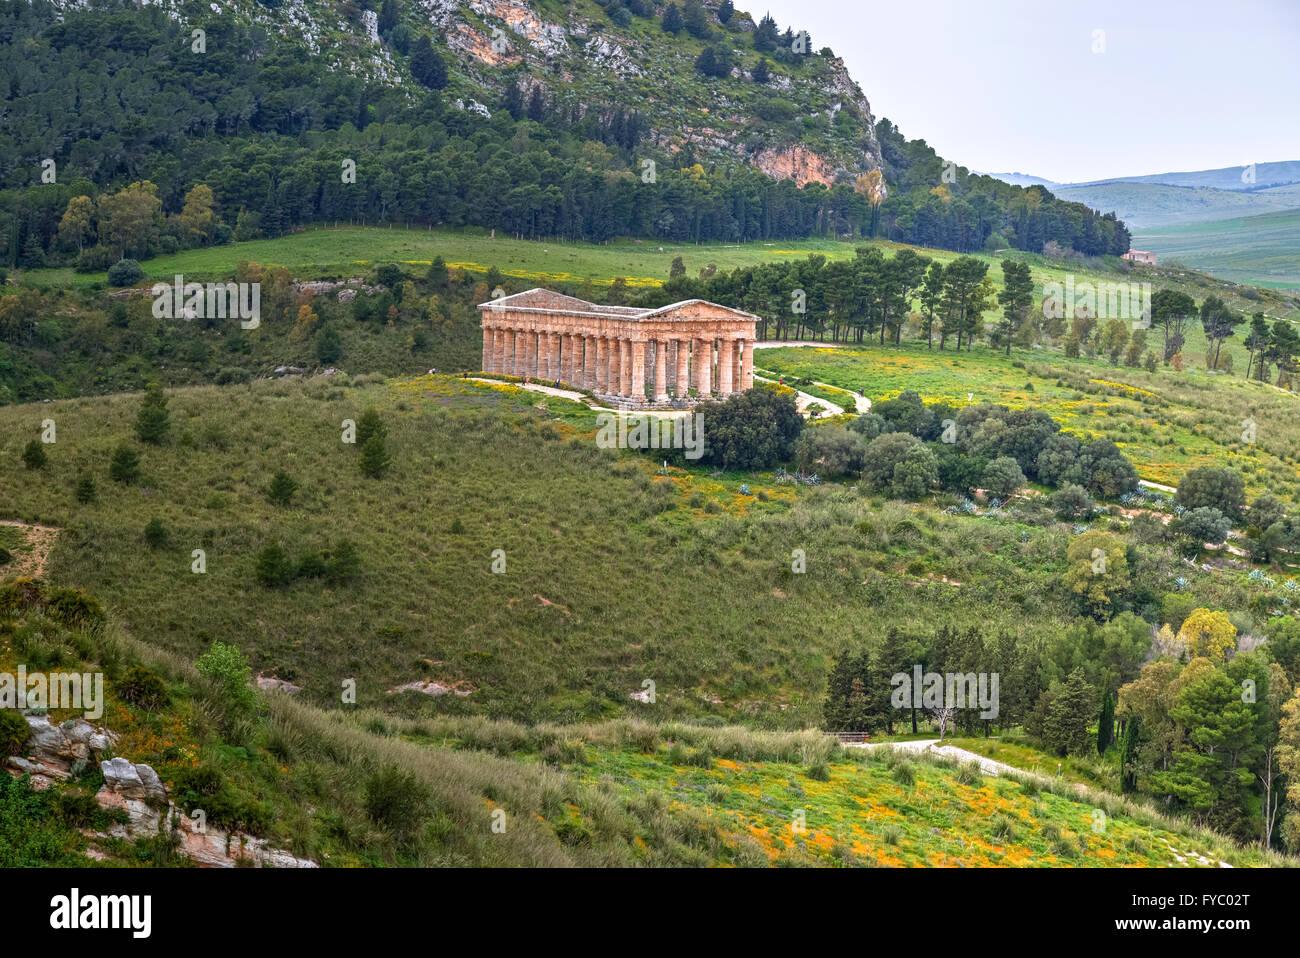 Segesta, Calatafimi, Trapani, Sicily, Italy - Stock Image